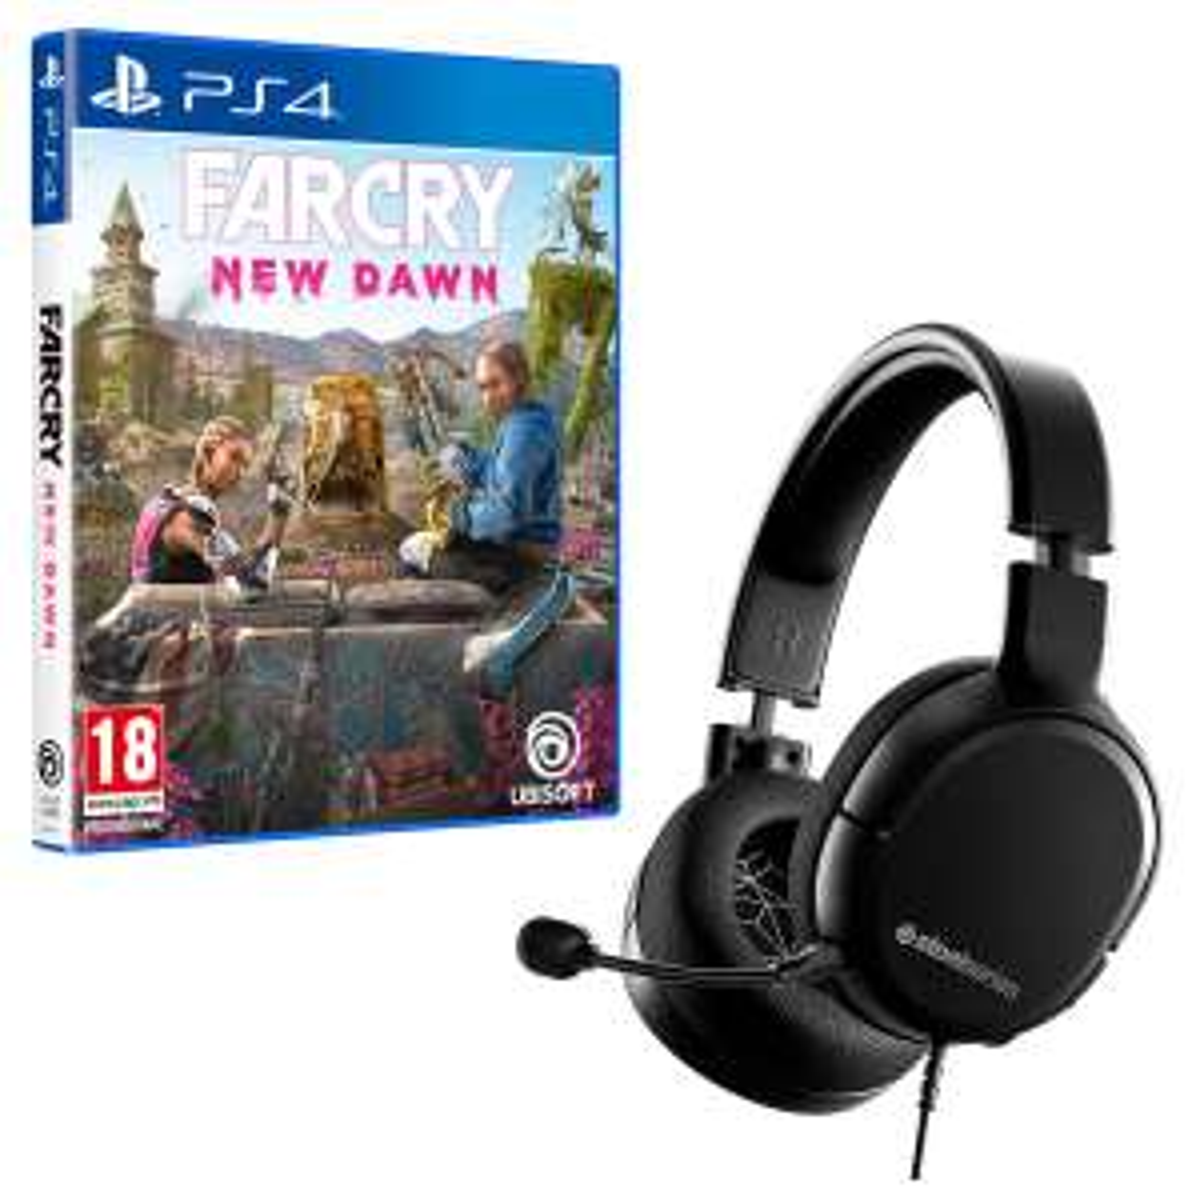 Casque Gamer Arctis 1 Multi-plateforme + Far Cry New Dawn sur PS4